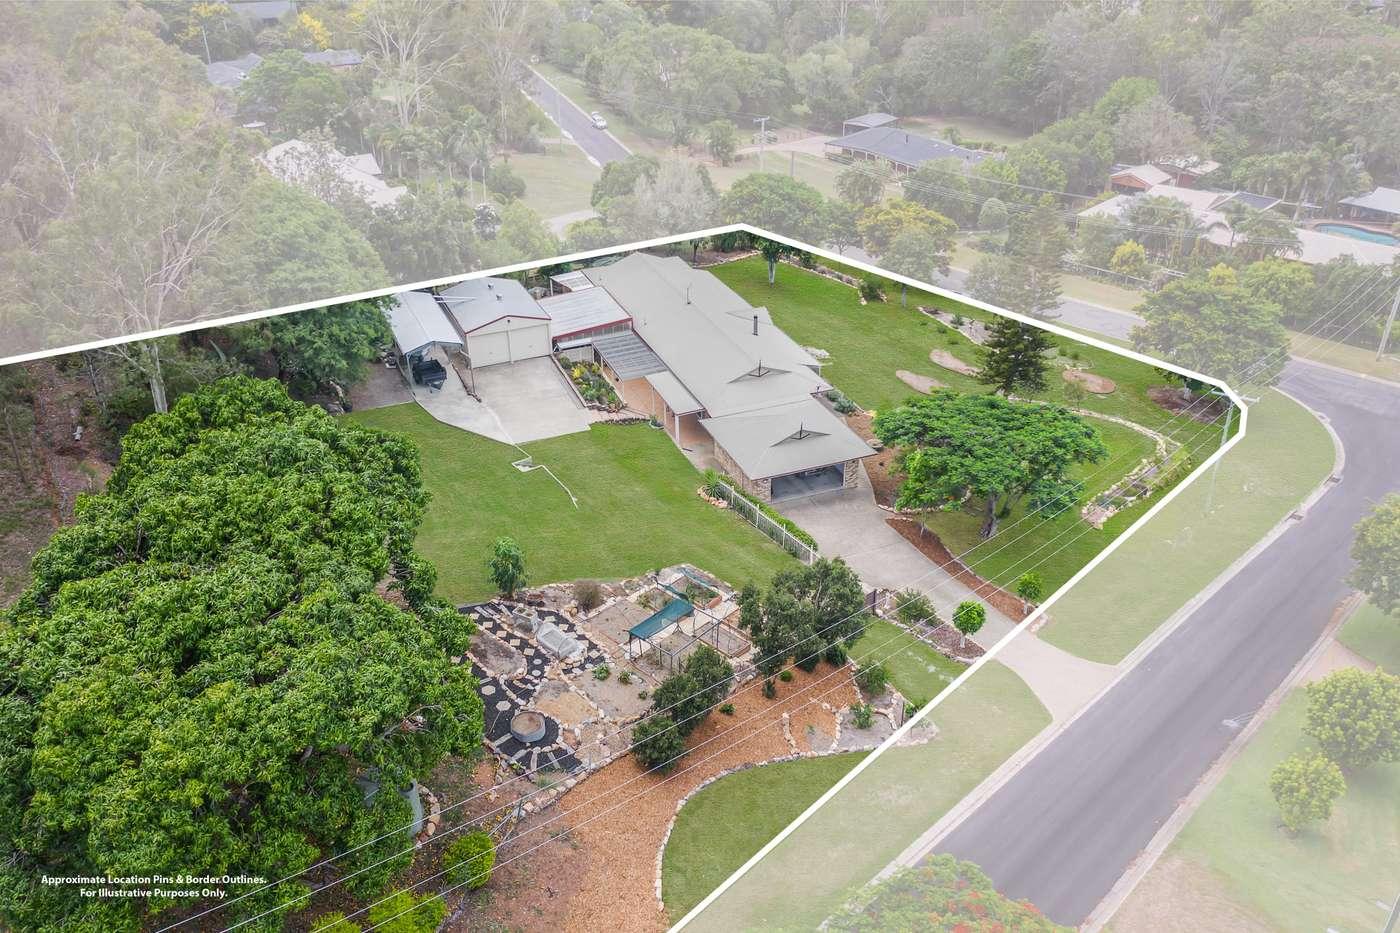 Main view of Homely house listing, 24-26 New Horizon Avenue, Bahrs Scrub, QLD 4207